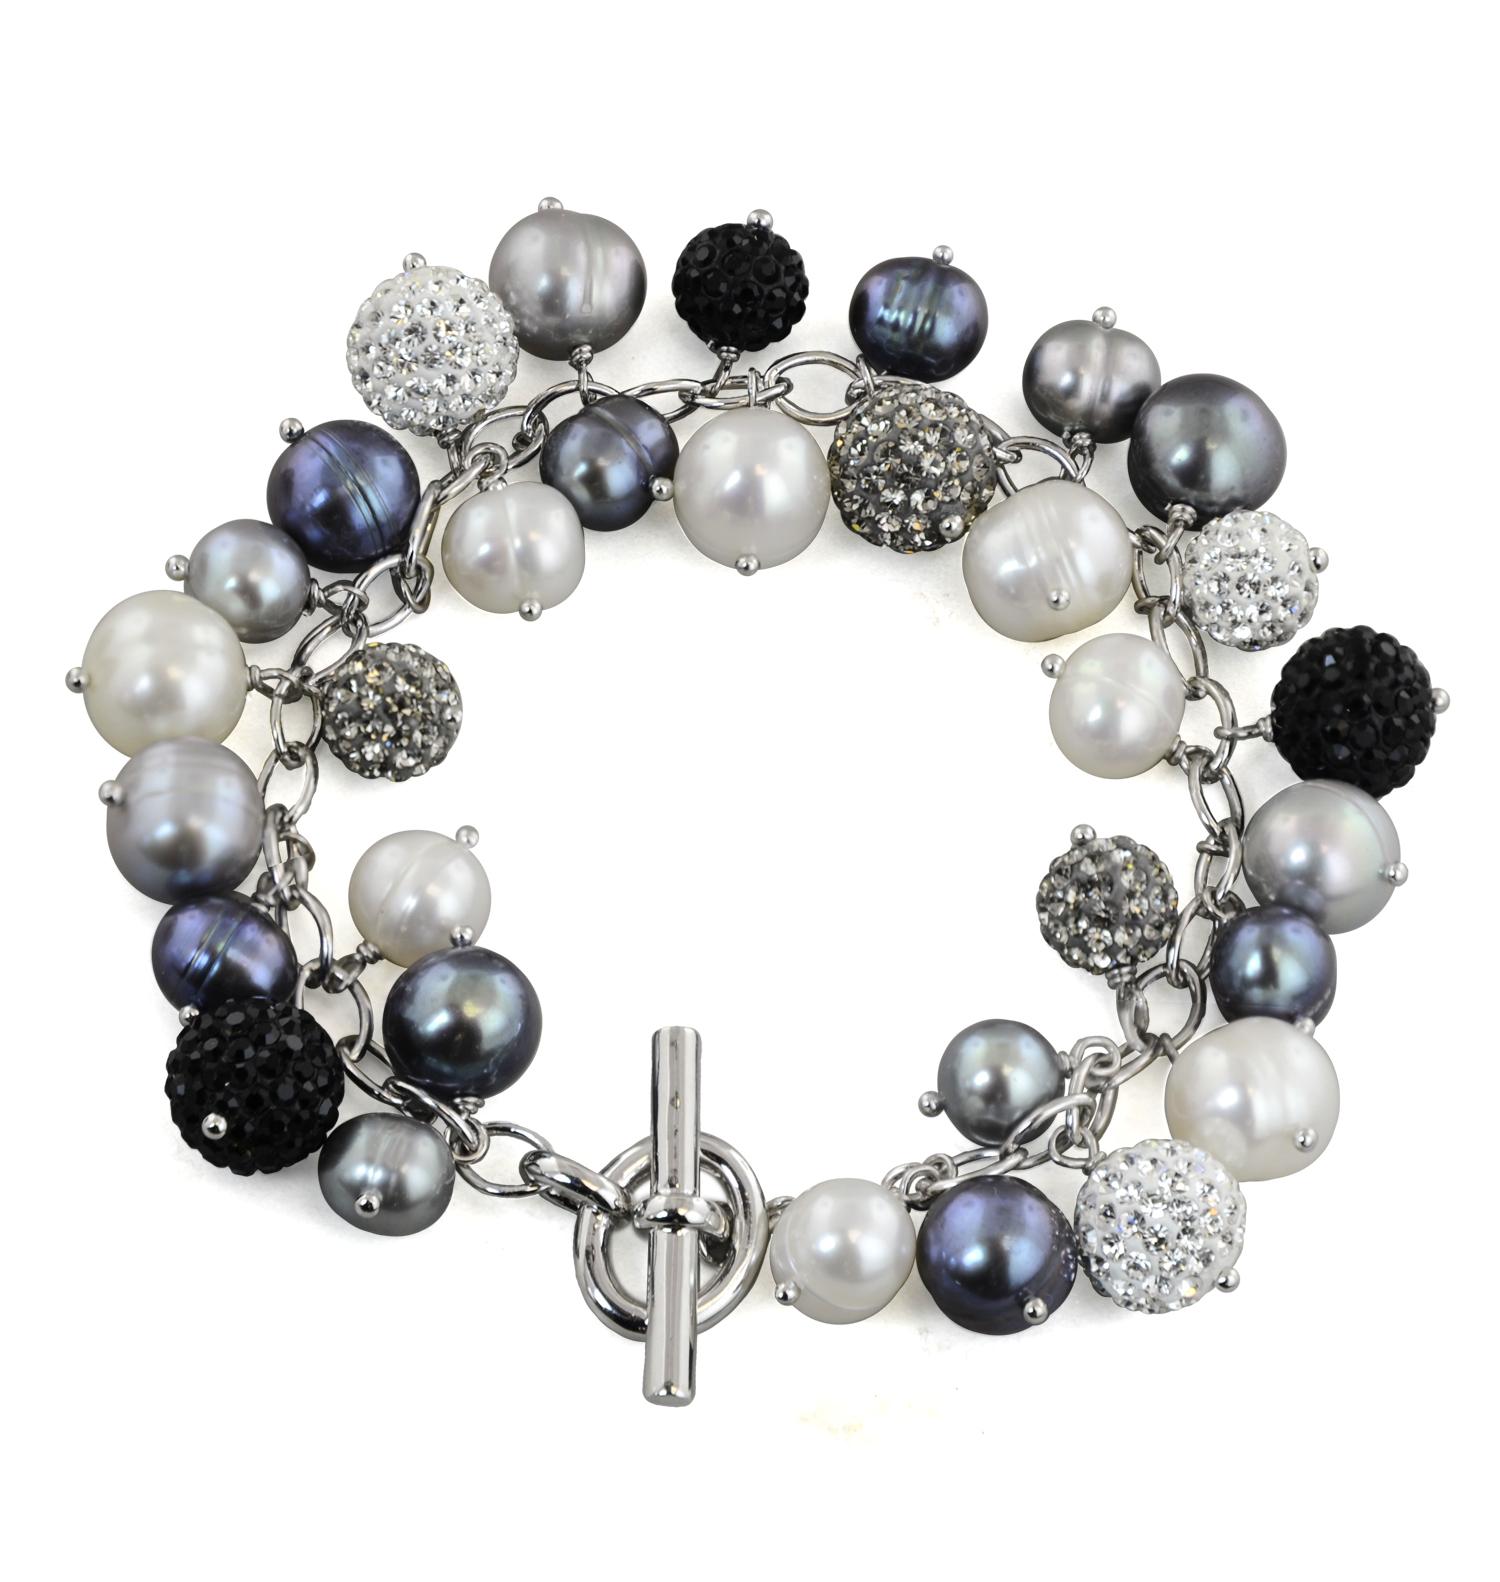 Honora Lb5762tux Jpg Brand Name Designer Jewelry In Orland Park Illinois